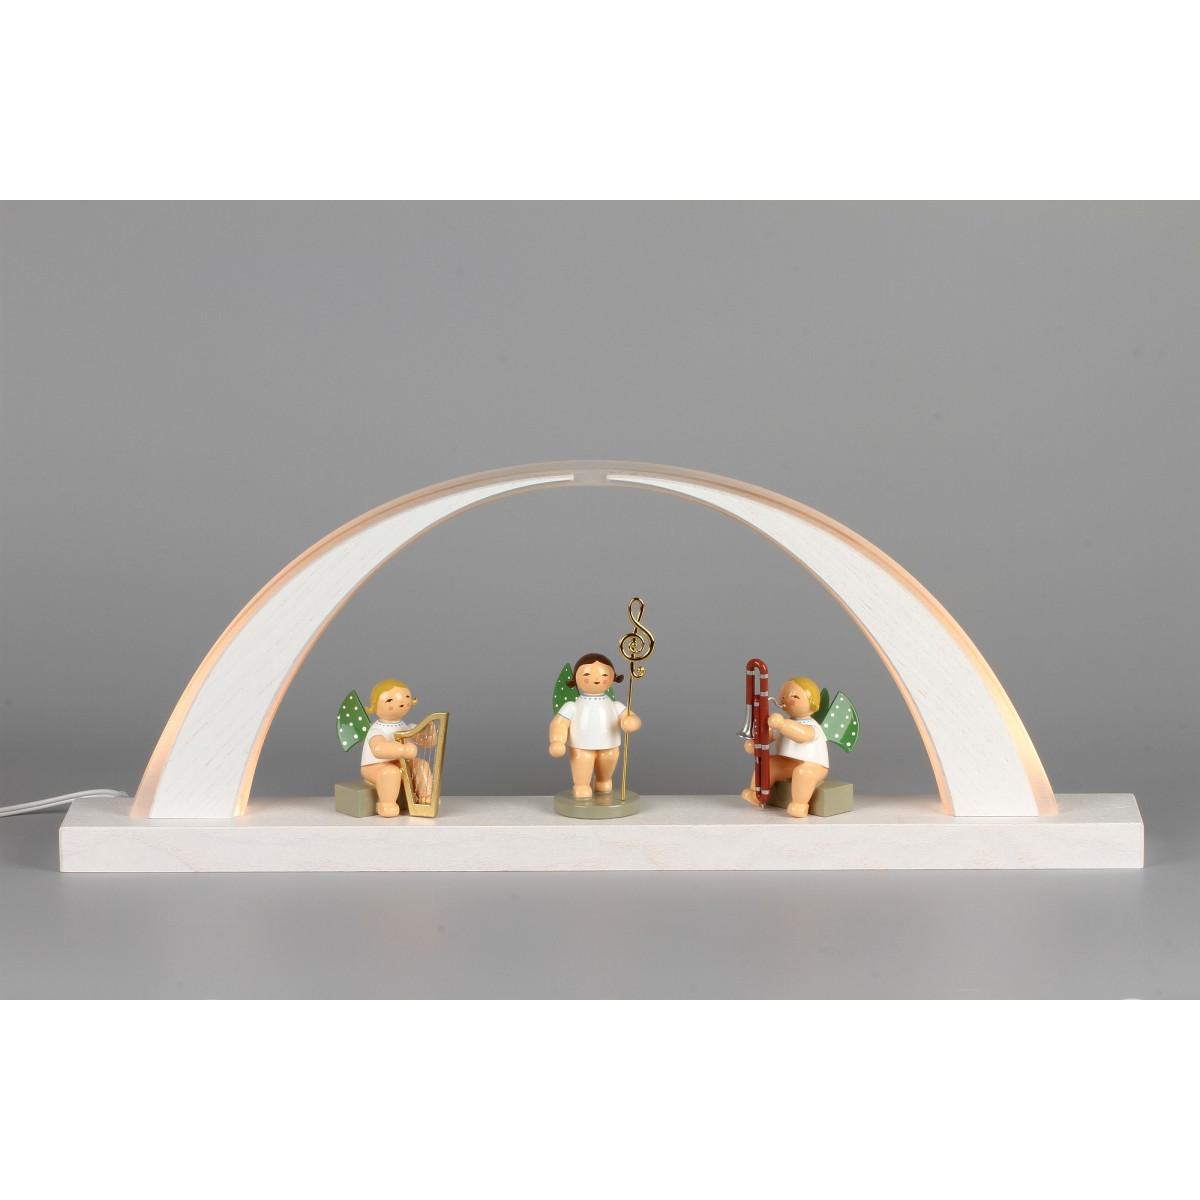 led schwibbogen esche wei mit wendt k hn engeln erzgebirgskunst drechsel. Black Bedroom Furniture Sets. Home Design Ideas